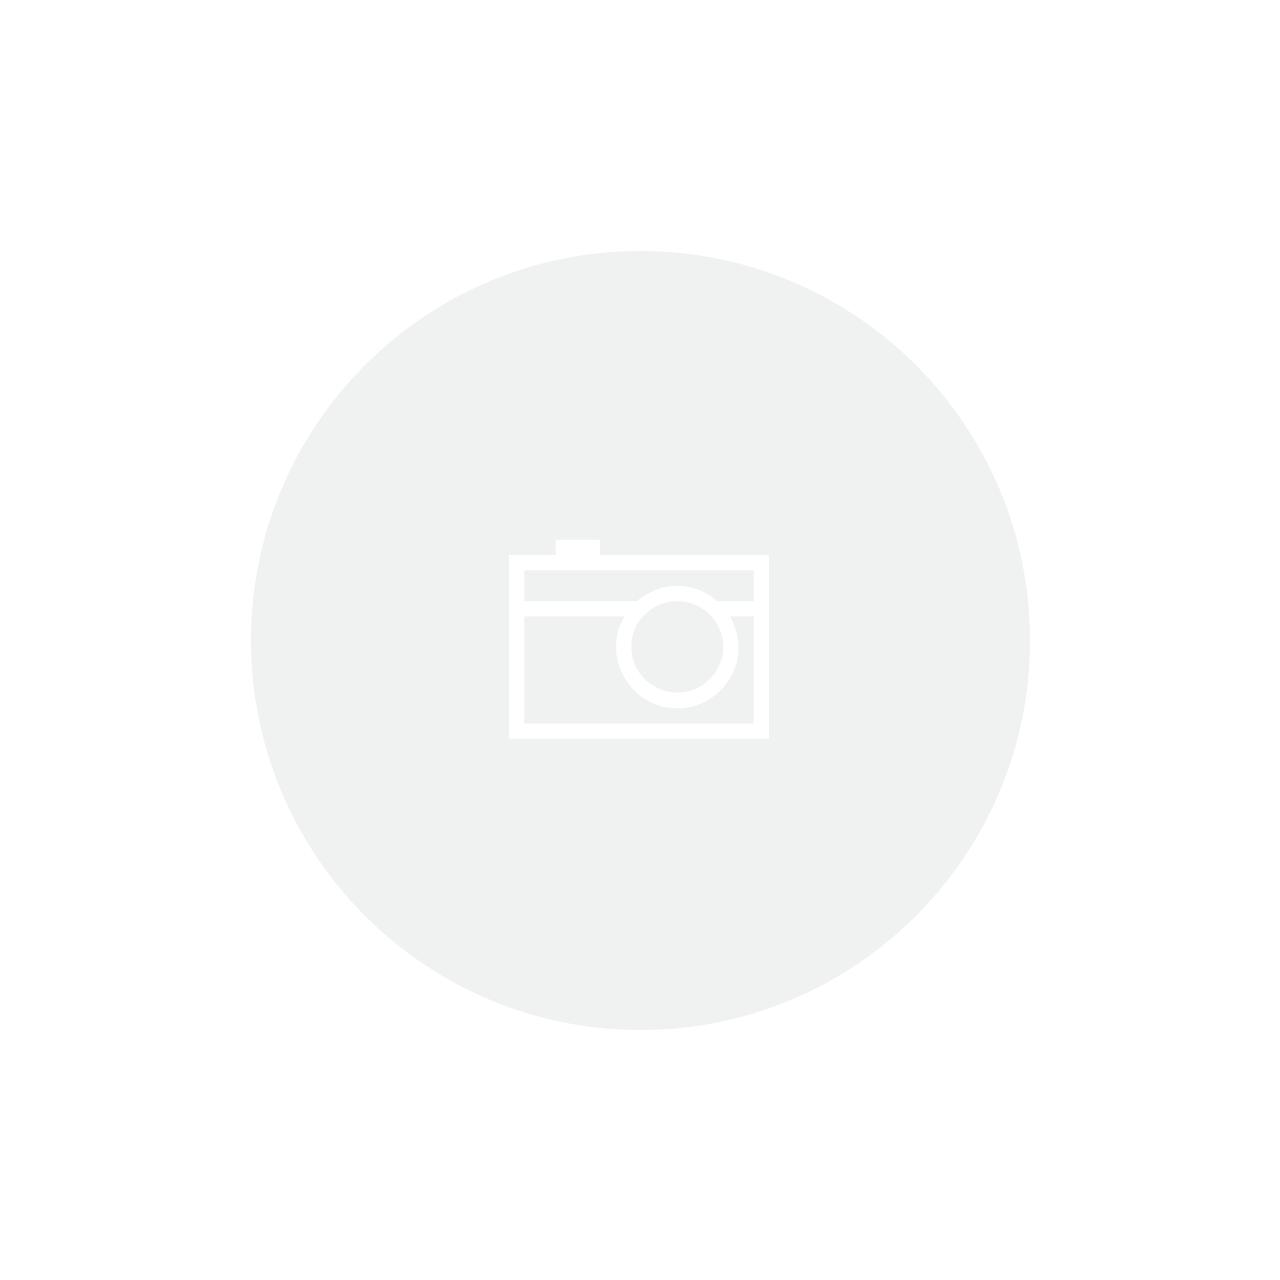 PLACA DE VÍDEO GIGABYTE GEFORCE GTX 1080 TURBO OC 8GB, GV-N1080TTOC-8GD